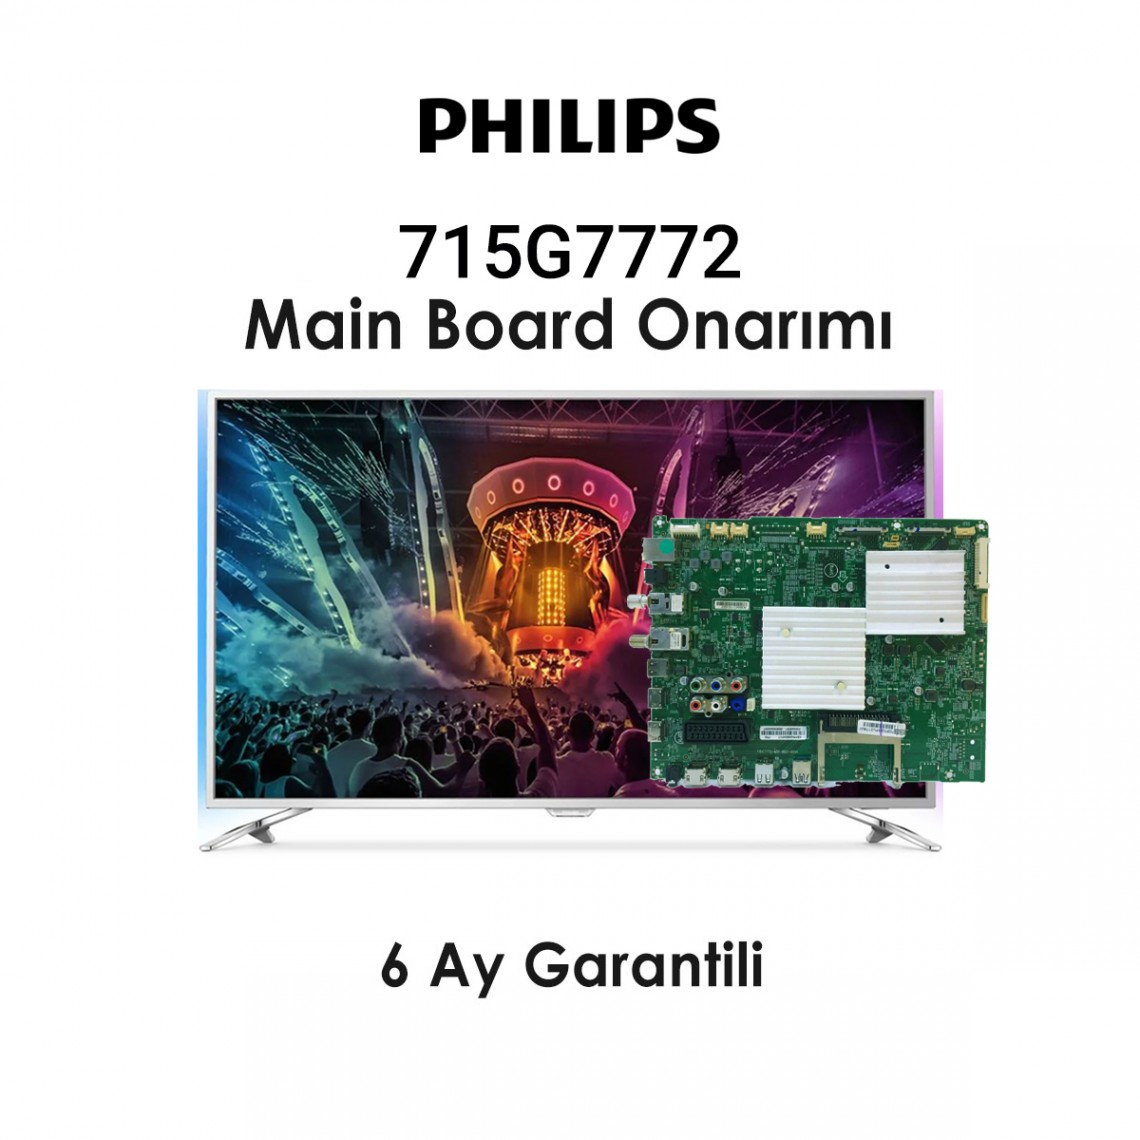 PHILIPS, QM16.3E, 715G7772-M01-B00-005K , 715G7772-M0D-B00-005K , MAIN BOARD ONARIMI